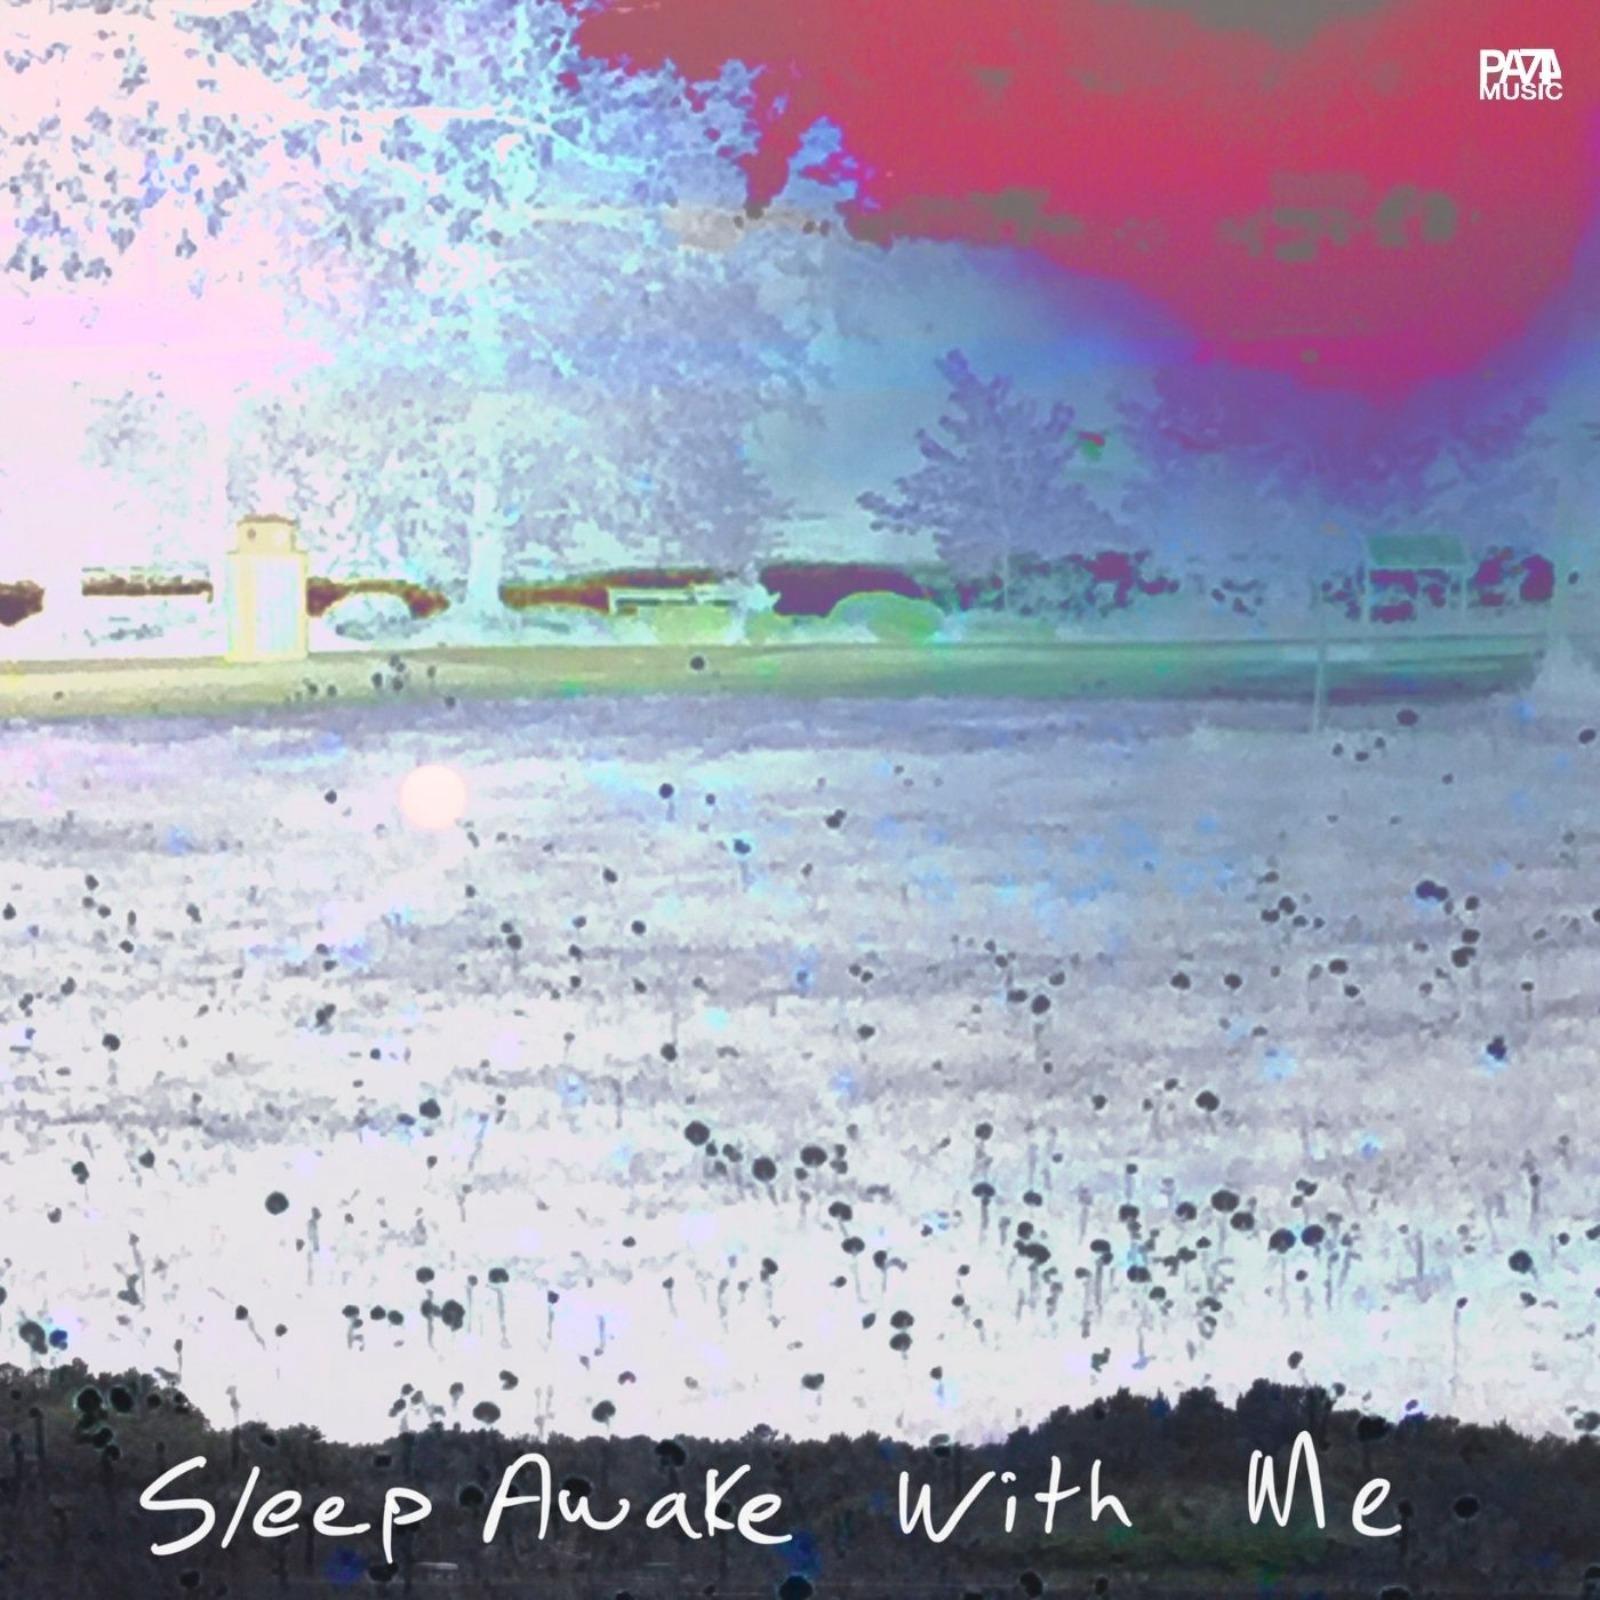 "LOW KEY TRAMPOLINE ""Sleep Awake with me"" ©PA74 Music"